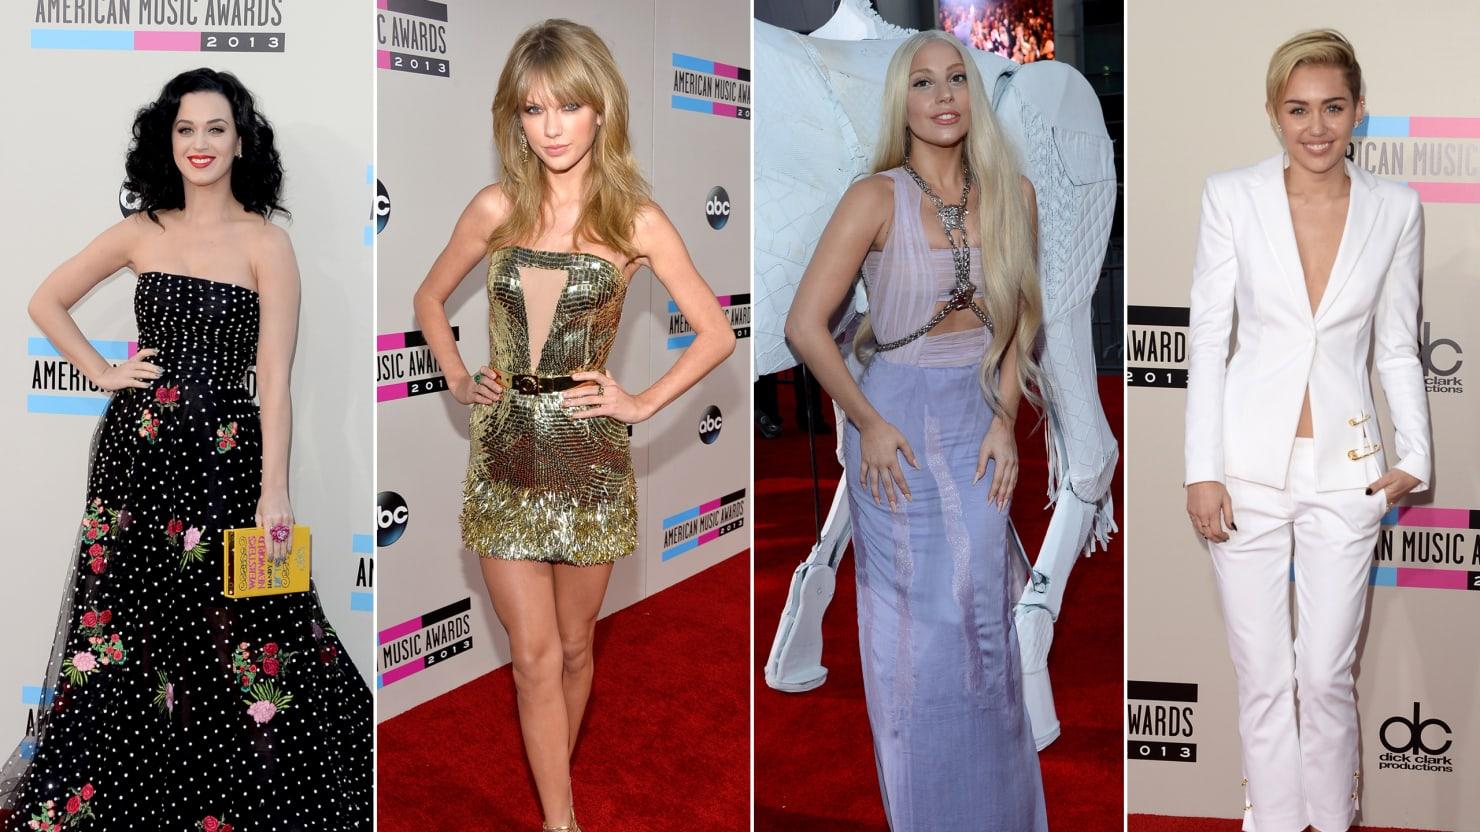 Best of AMA Red Carpet 2013